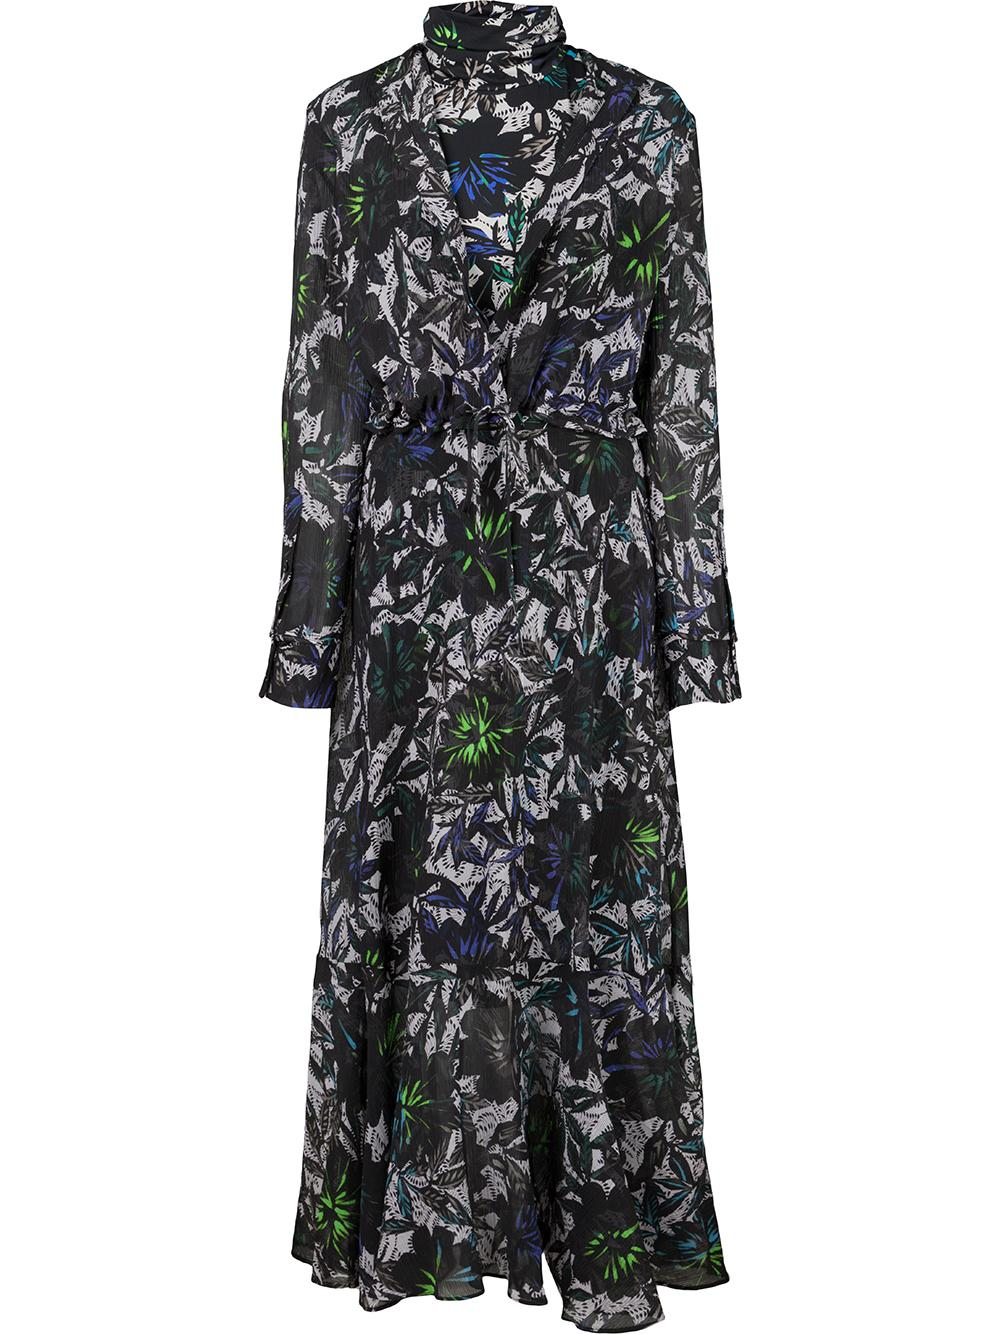 Exotic Flowering Dress Item # 549601